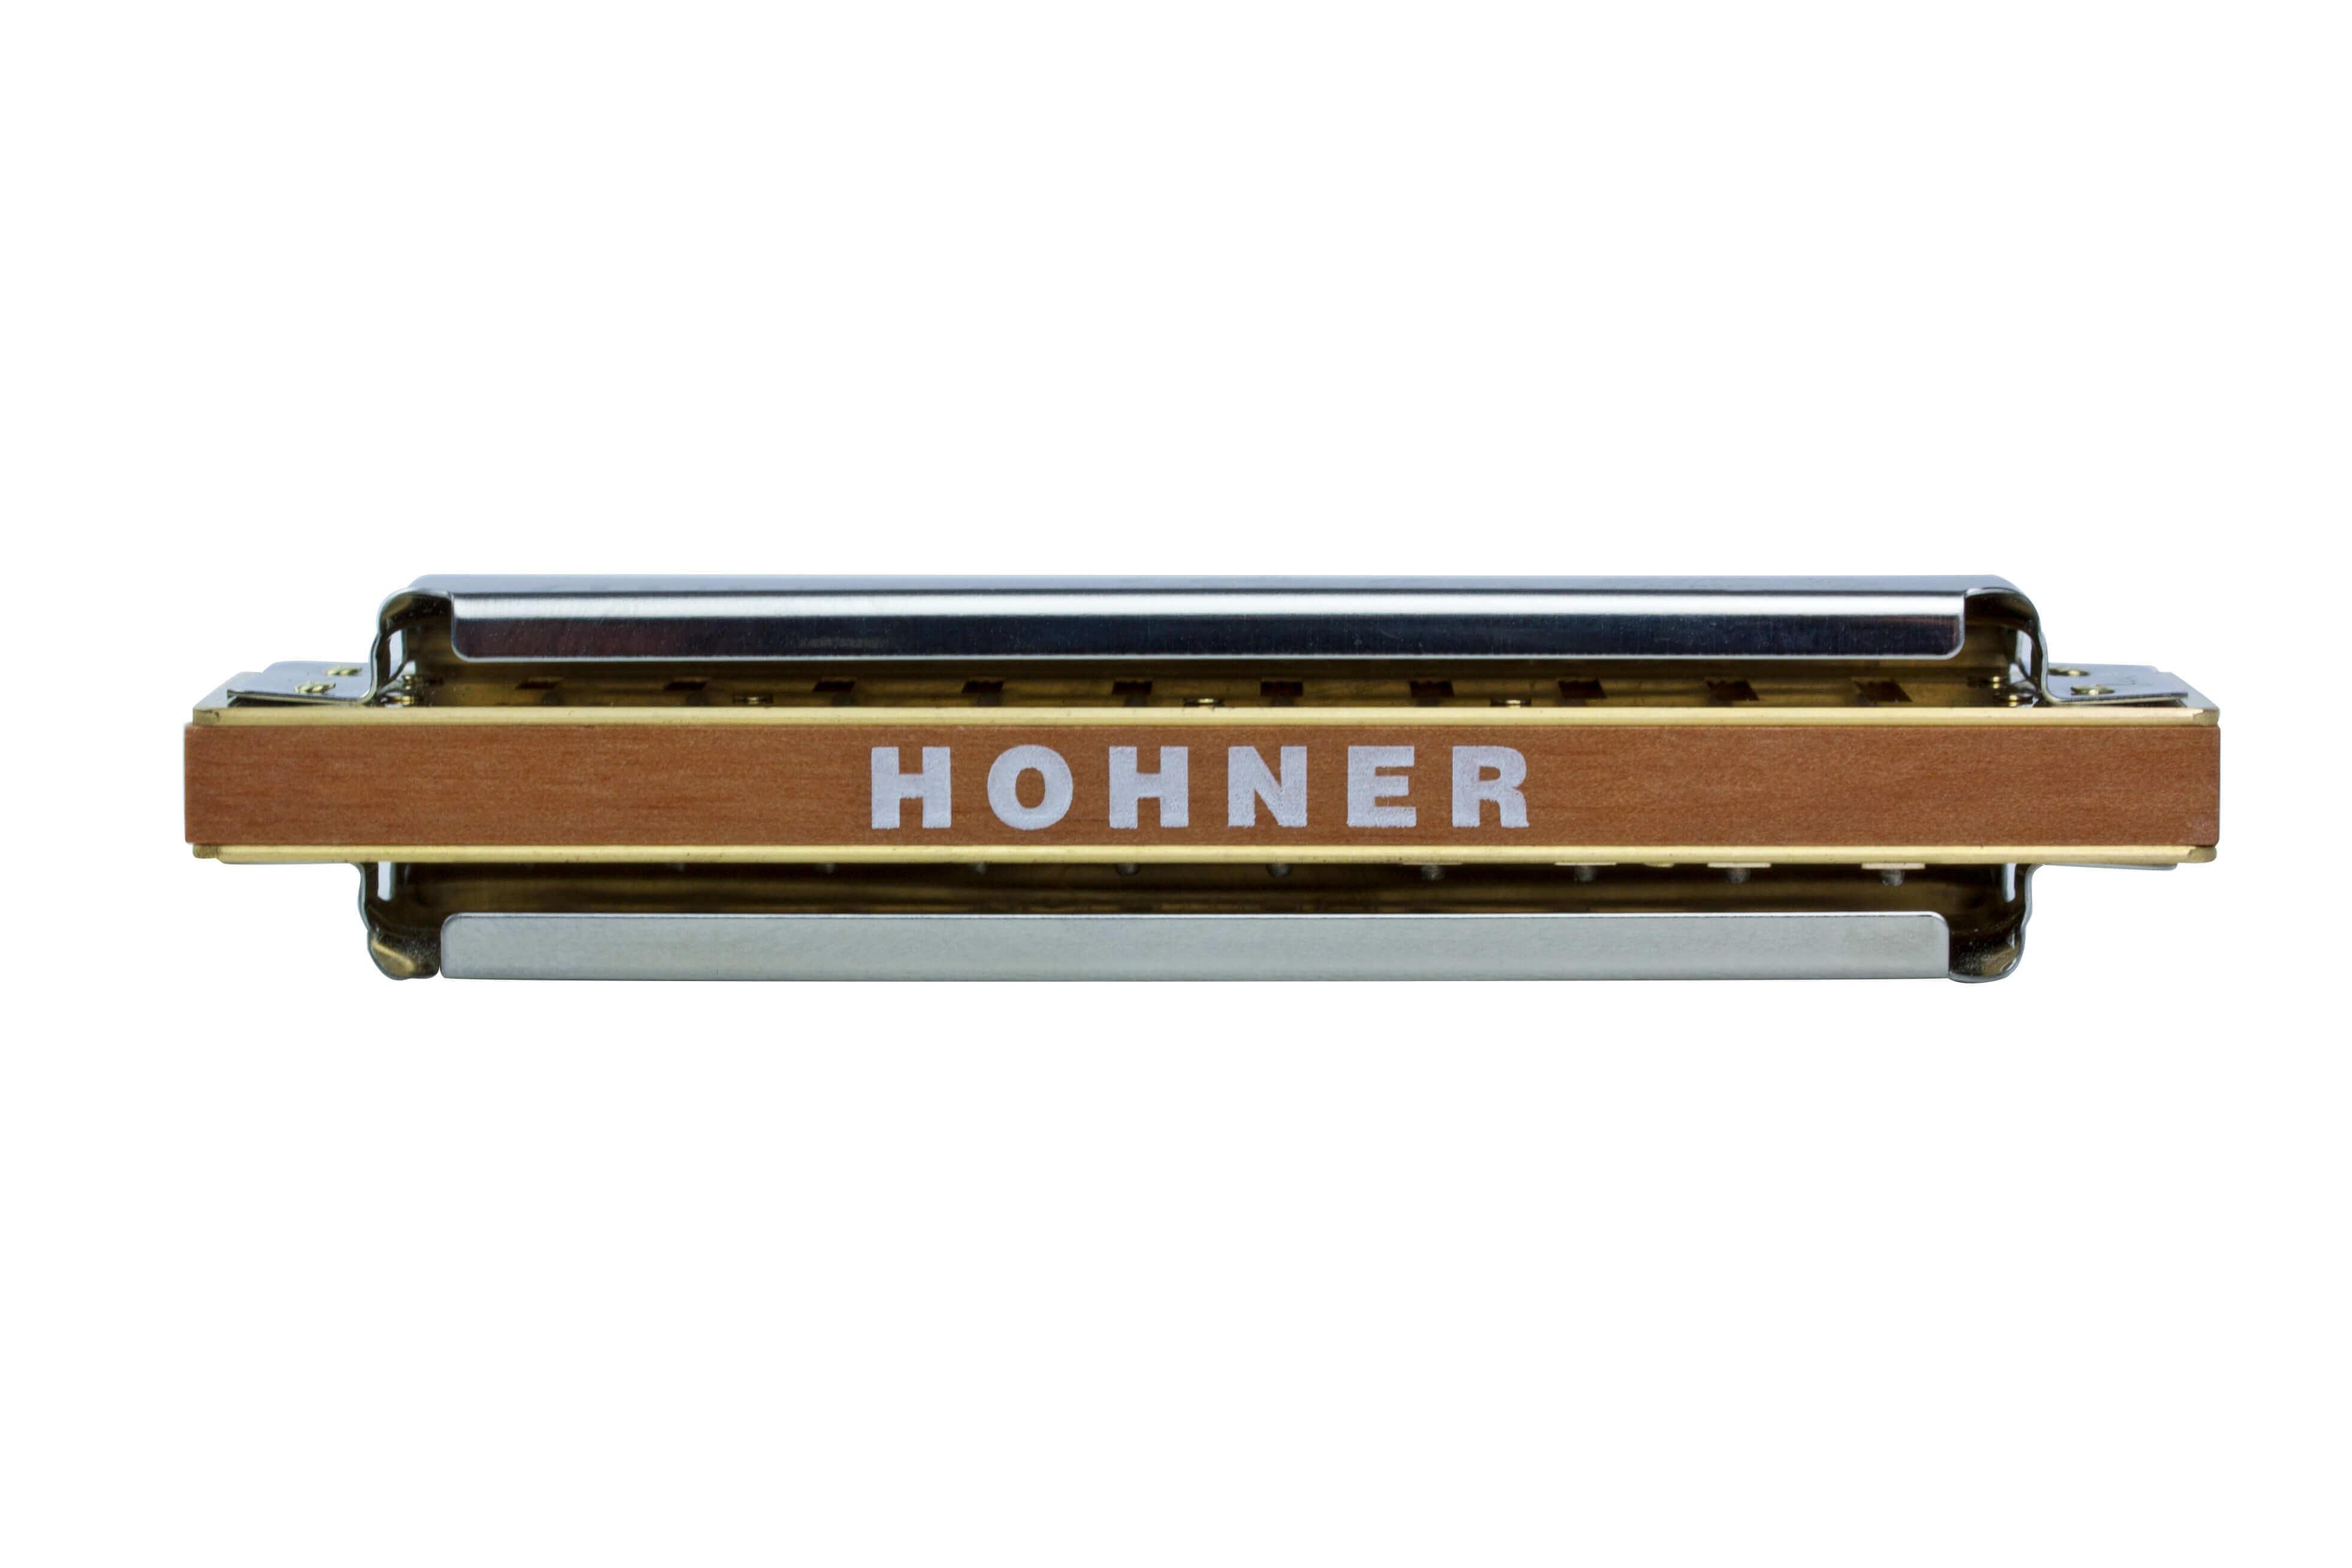 The original blues harmonica: HOHNER - enjoy music